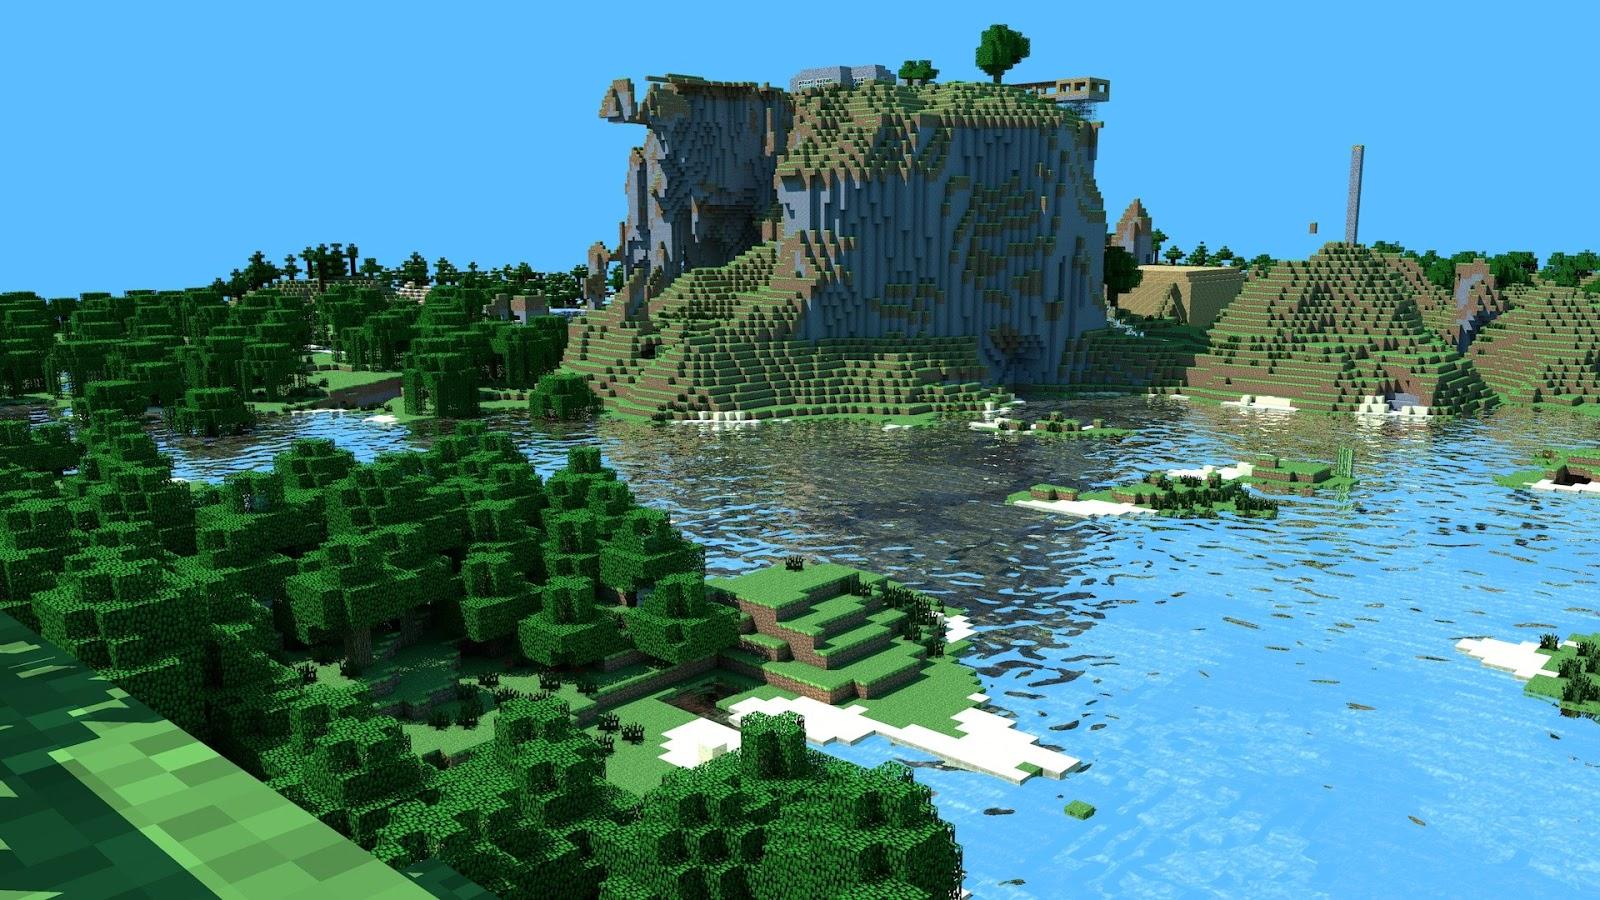 Cool Minecraft Wallpapers HD Wallpaper 1025x635